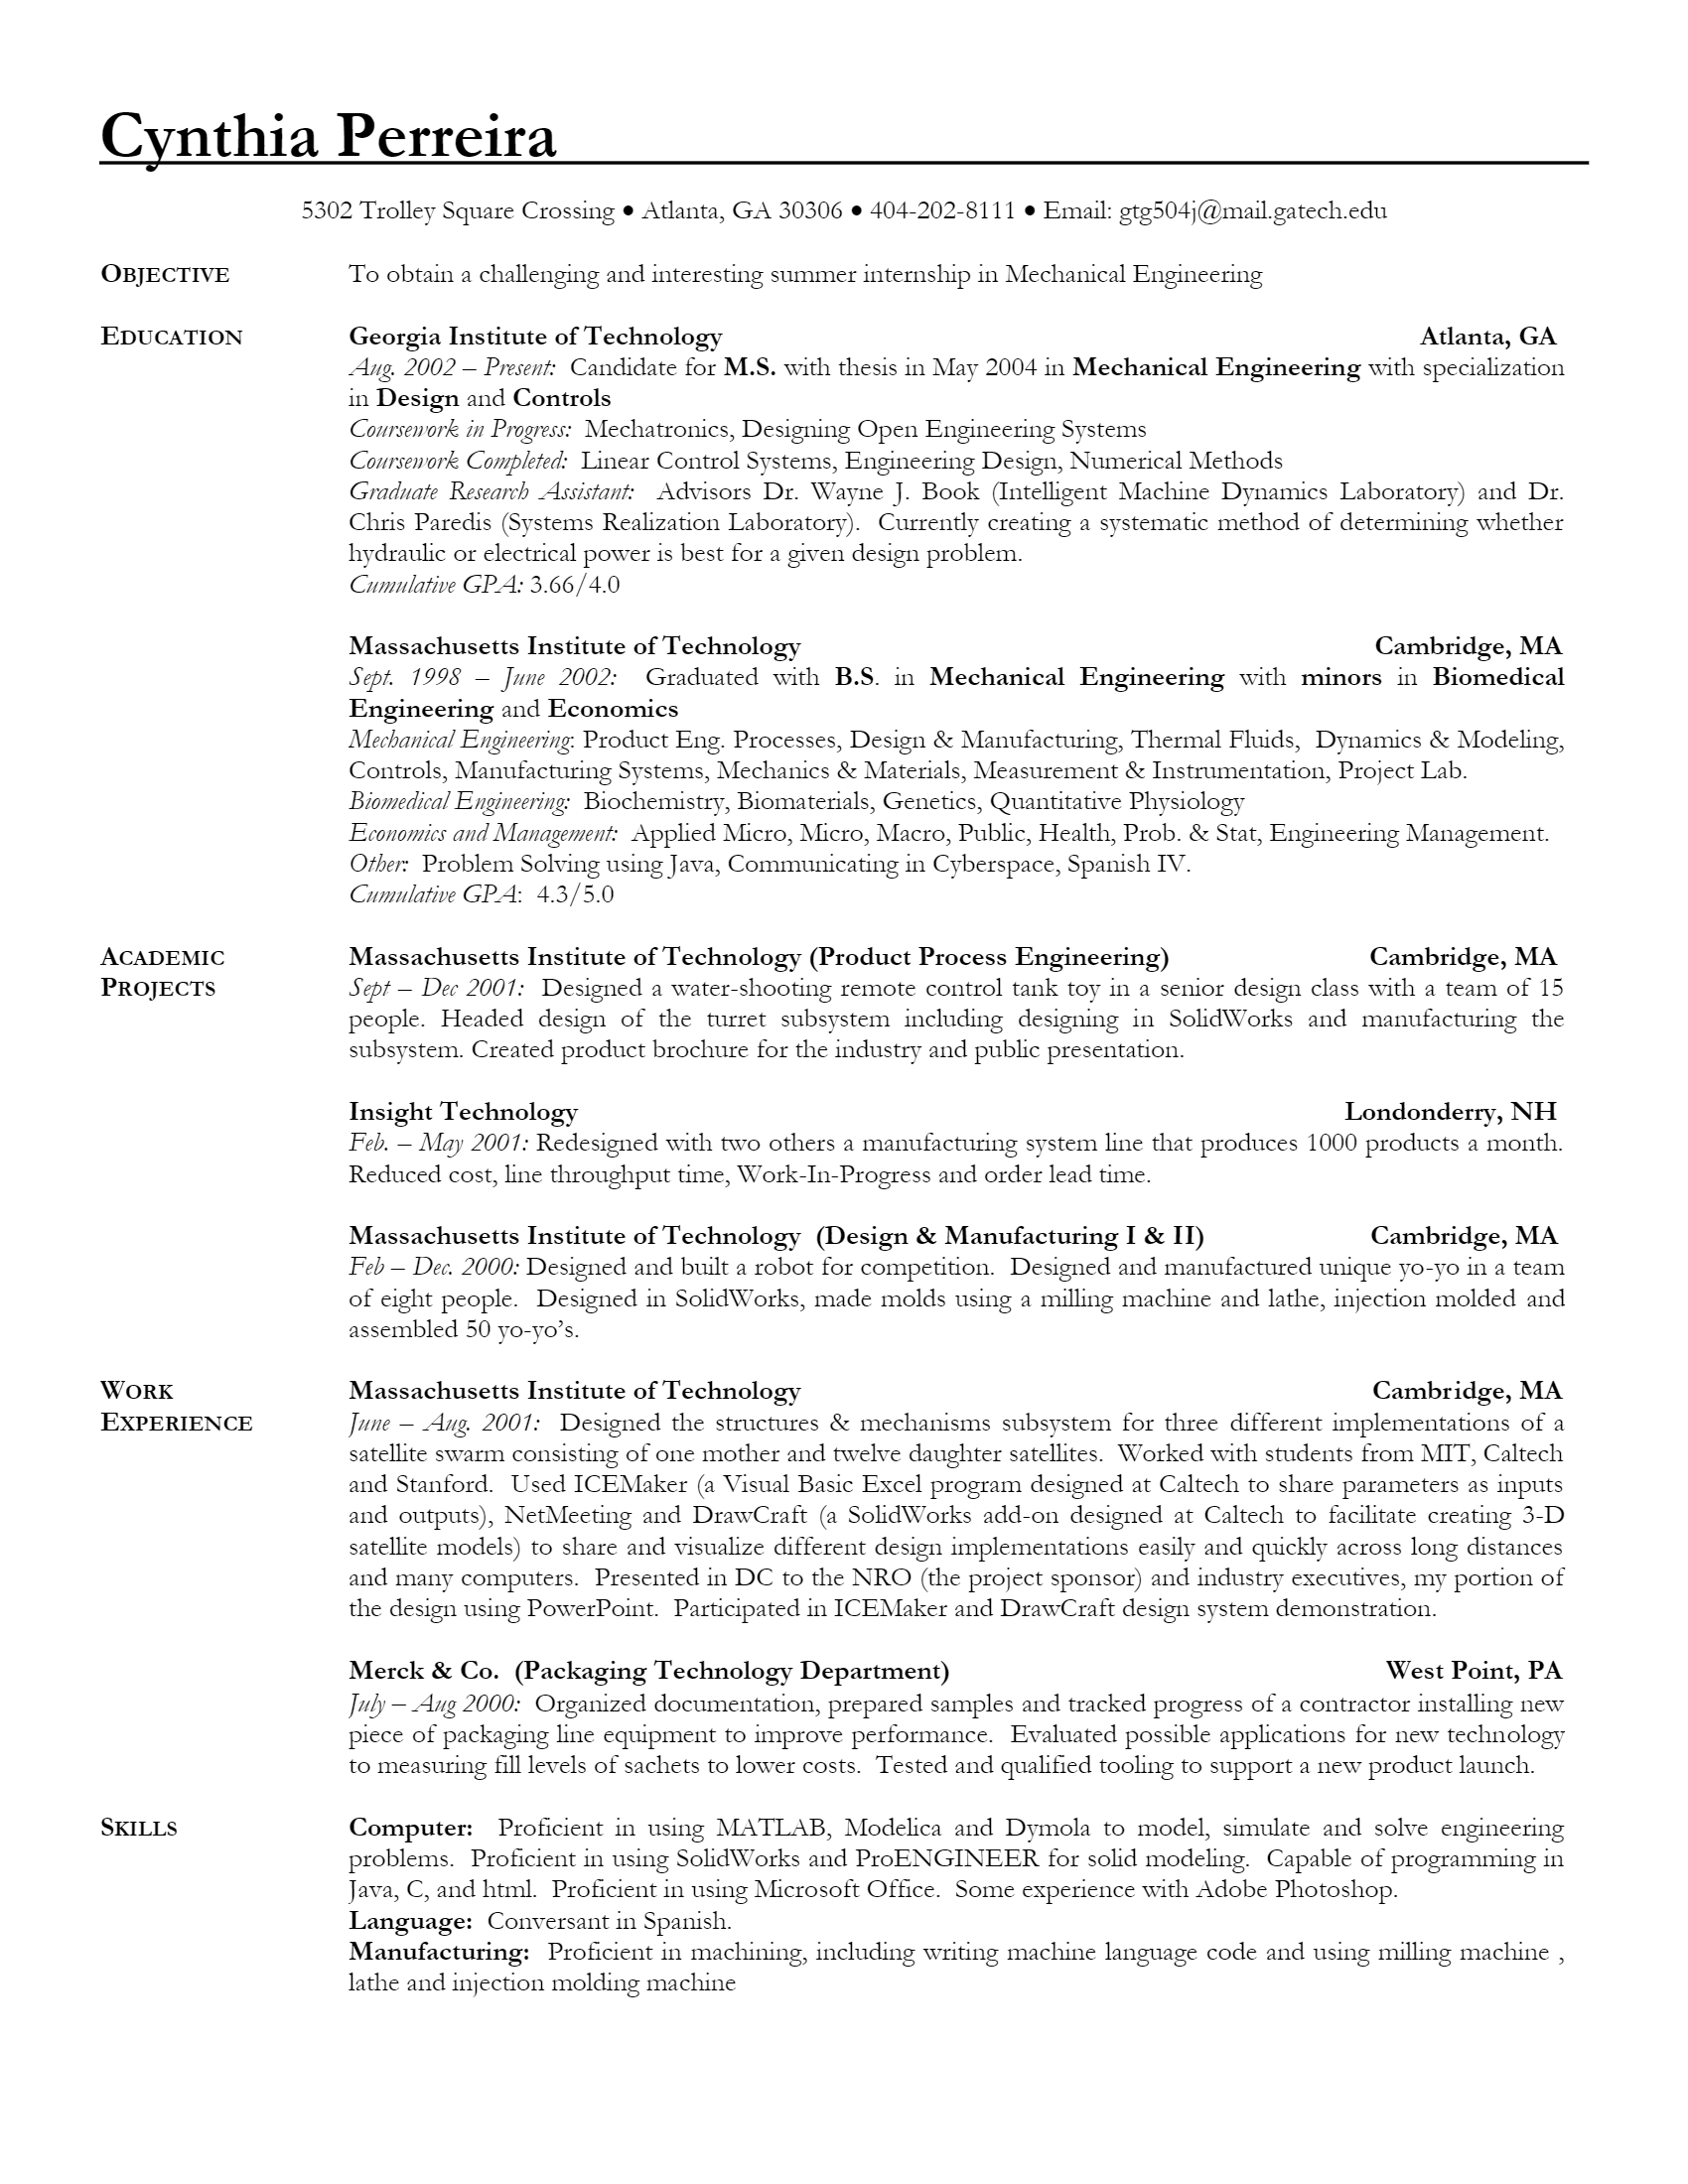 Mechanical Engineer > Mechanical Engineer .Docx (Word)